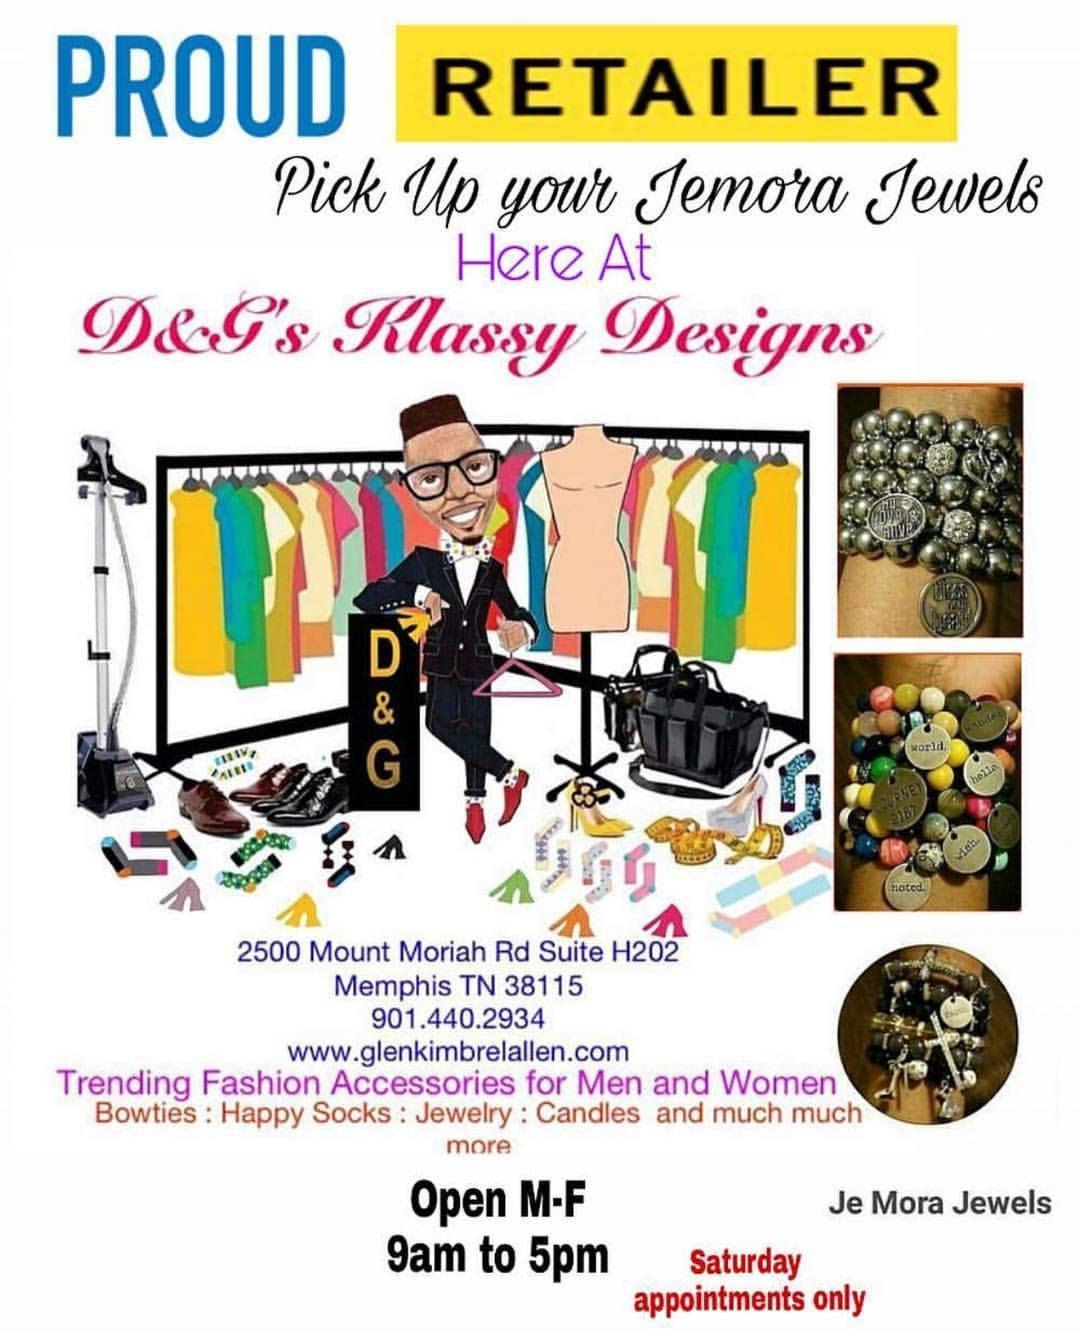 Jemora Jewels — Klass Is Always In Session At @Dgklassy Monday - Friday 9-5 Schedule